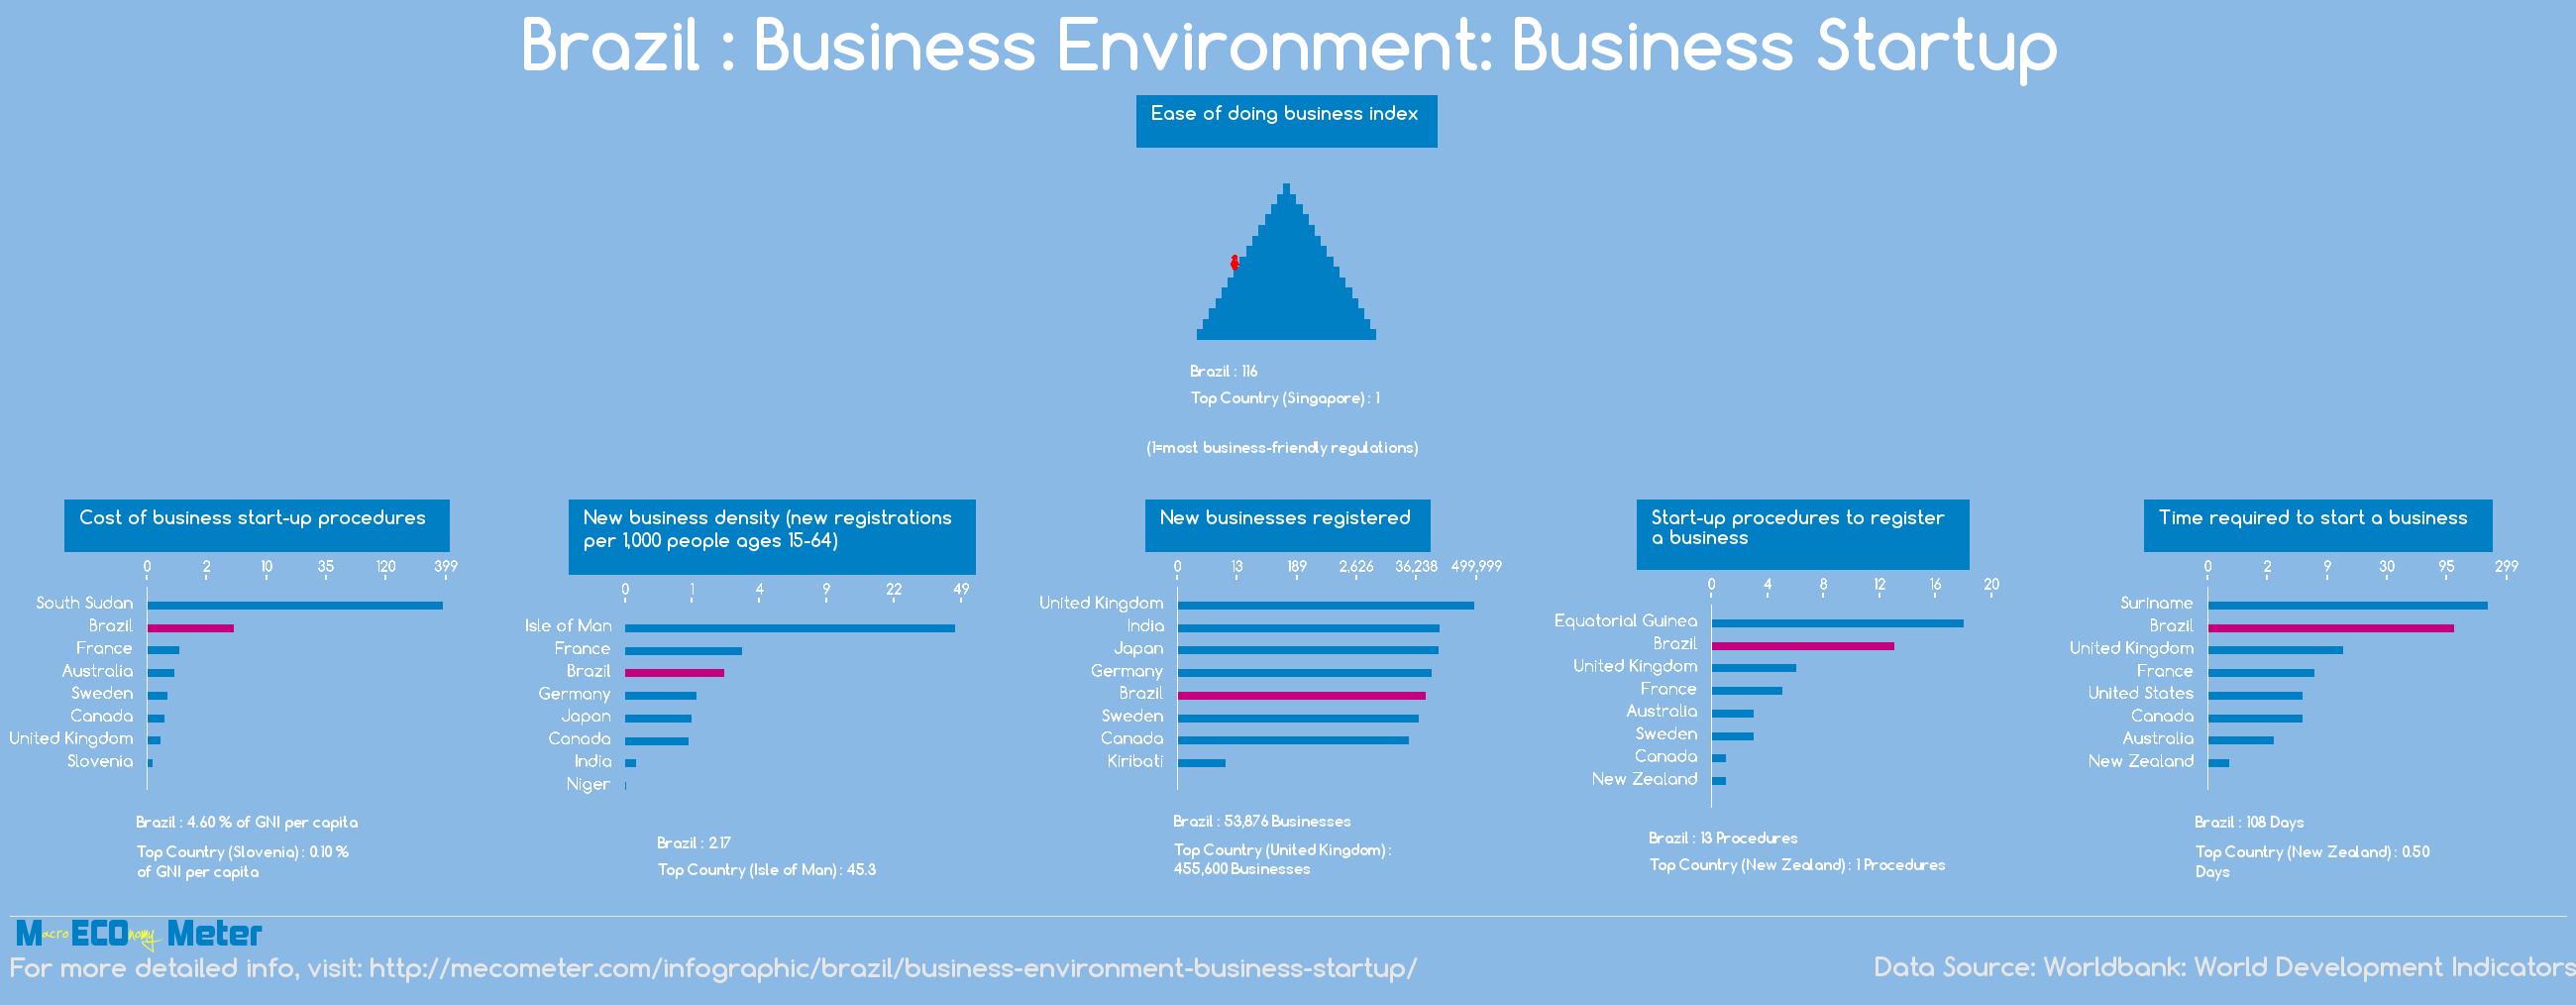 Brazil : Business Environment: Business Startup